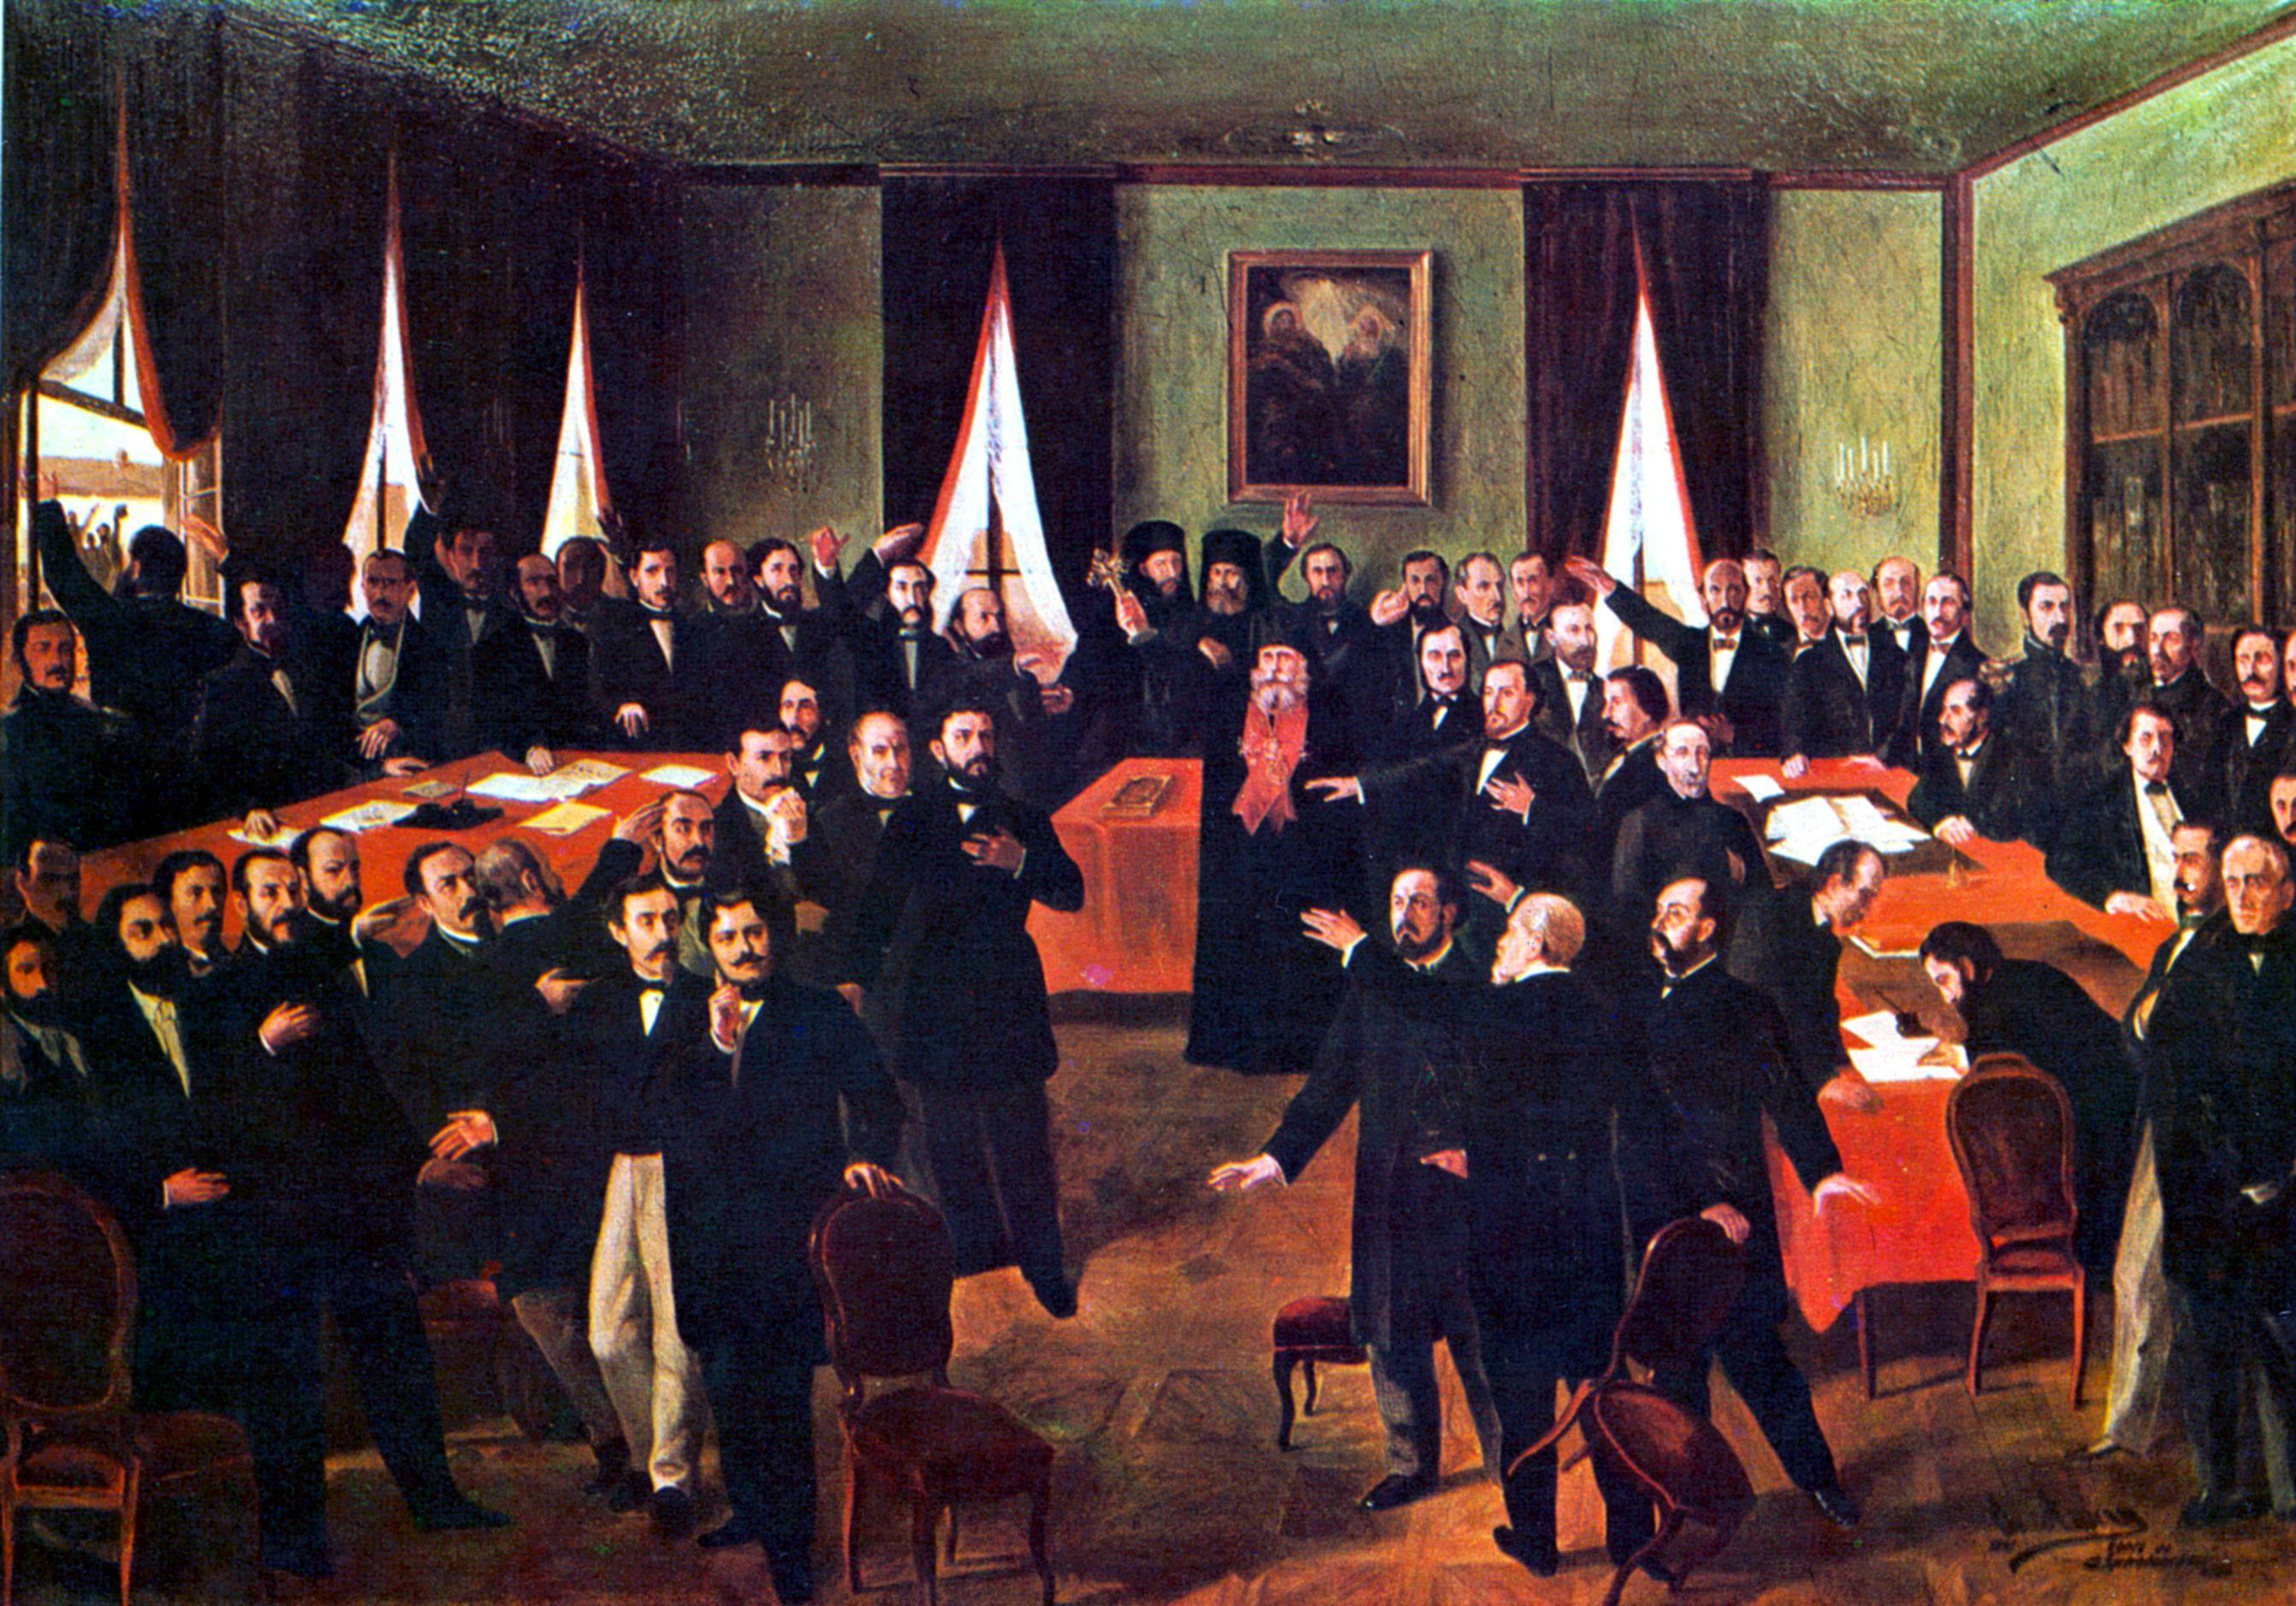 """Proclamarea Unirii""; Muzeul Naţional de Istorie a României. ""Proclamation of Union""; National Museum of Romanian History. By Theodor Aman (1831-1891) [Public domain], via Wikimedia Commons"